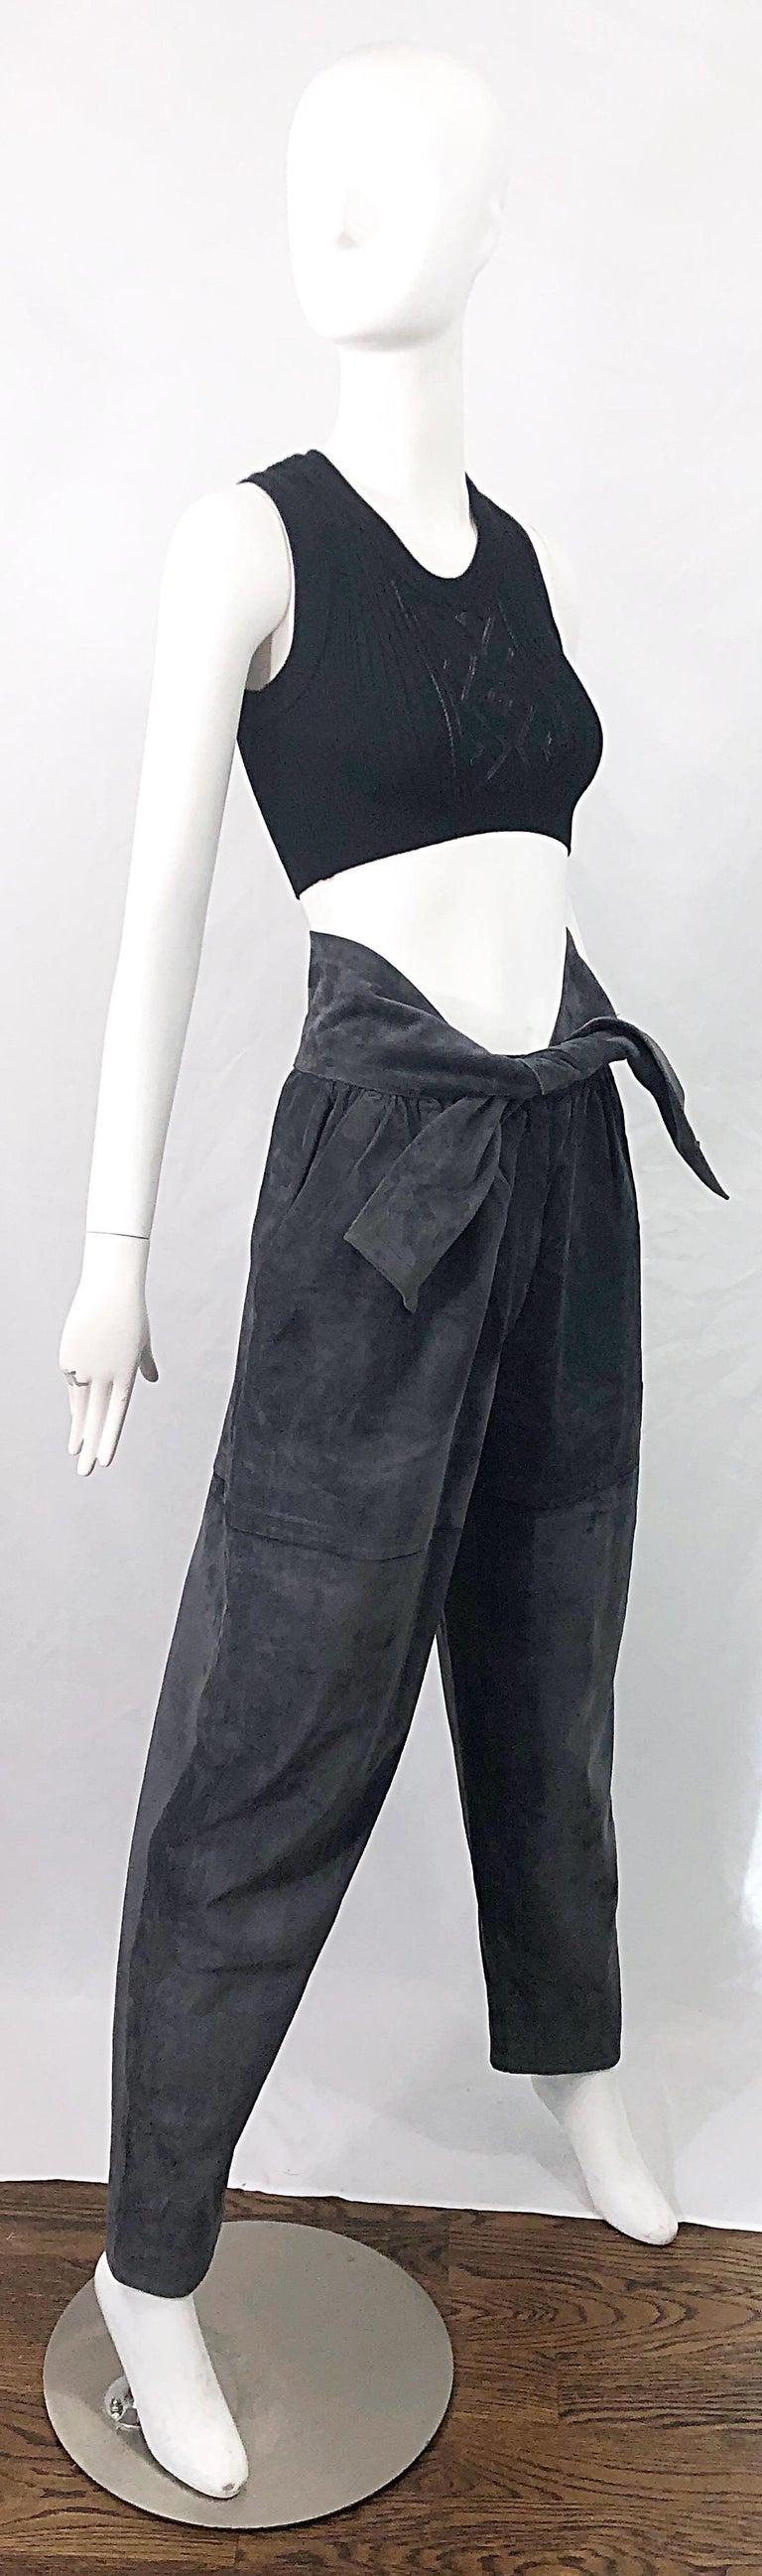 Vintage Yves Saint Laurent YSL 1980s Grey Suede Leather High Waisted Harem Pants For Sale 2